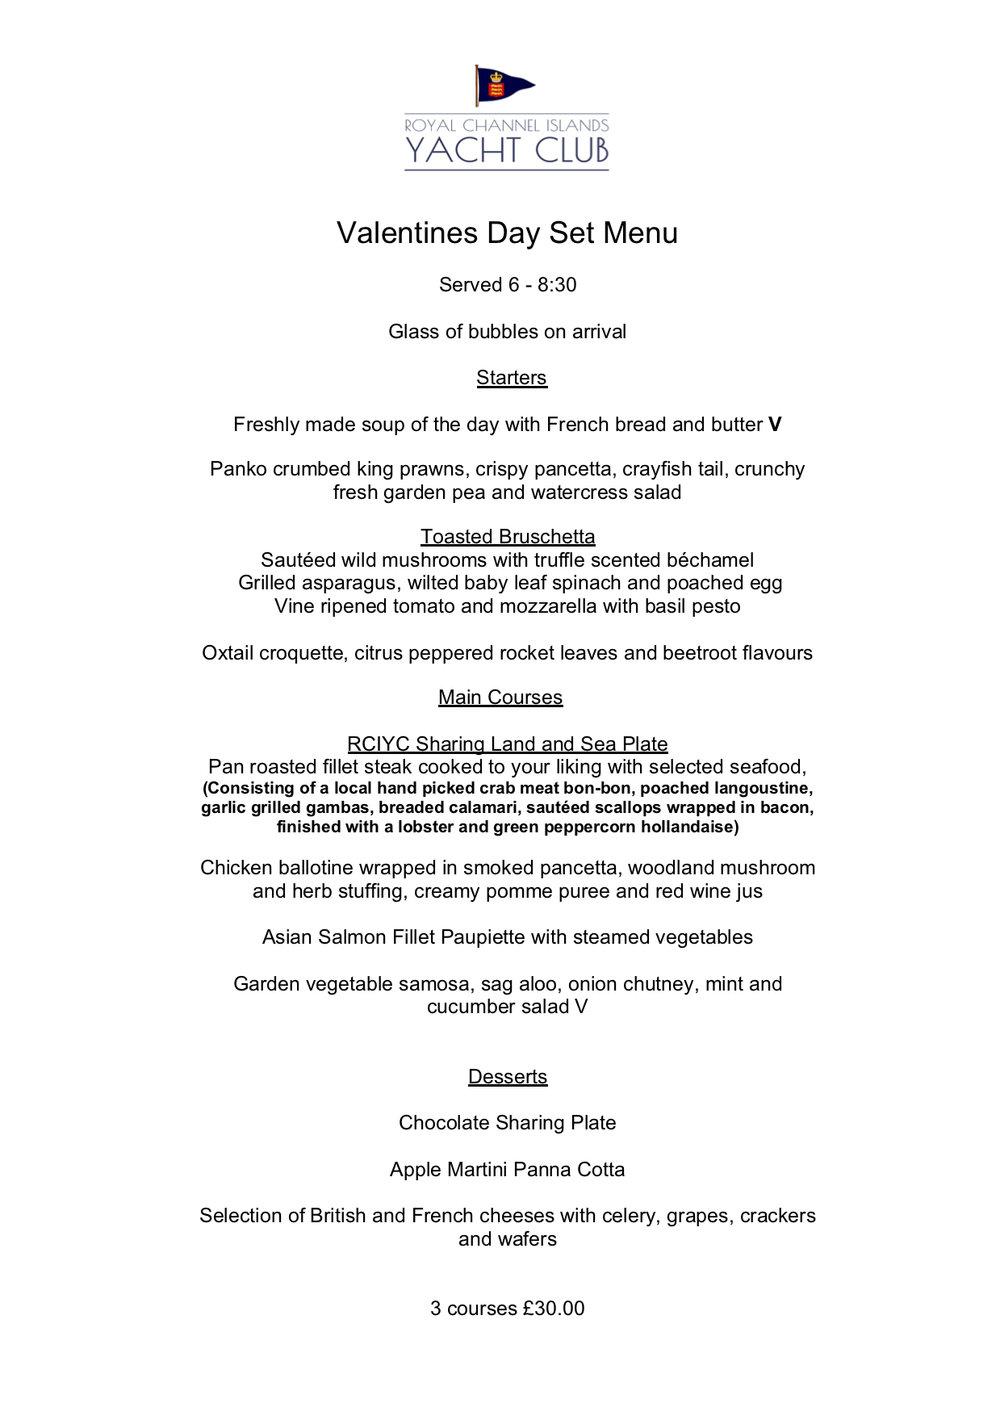 RCIYC Valentines Day Set Menu 2019.jpg